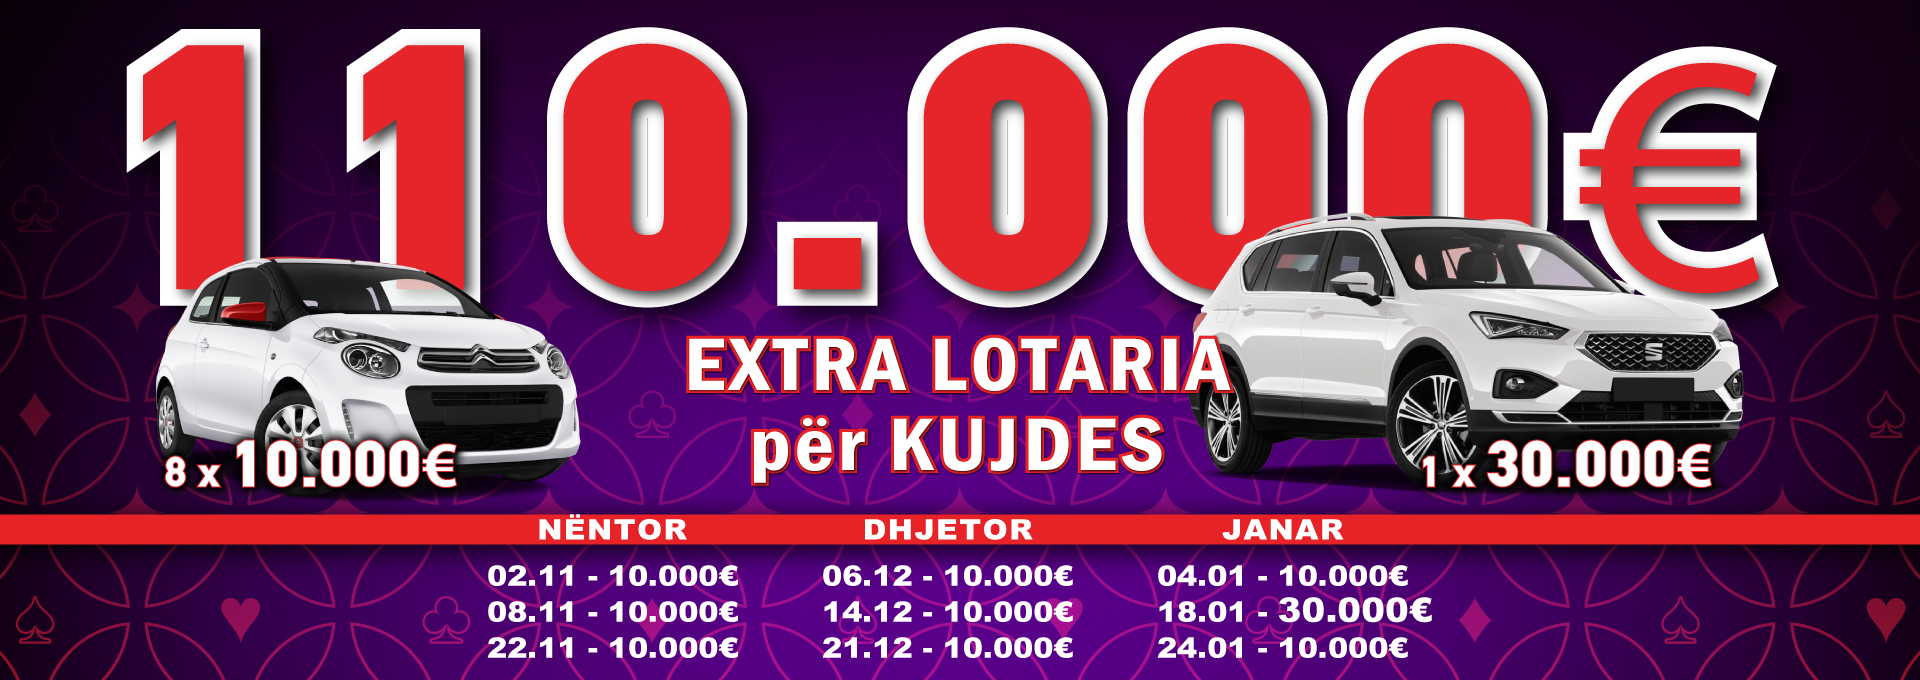 Extra Lotteries November